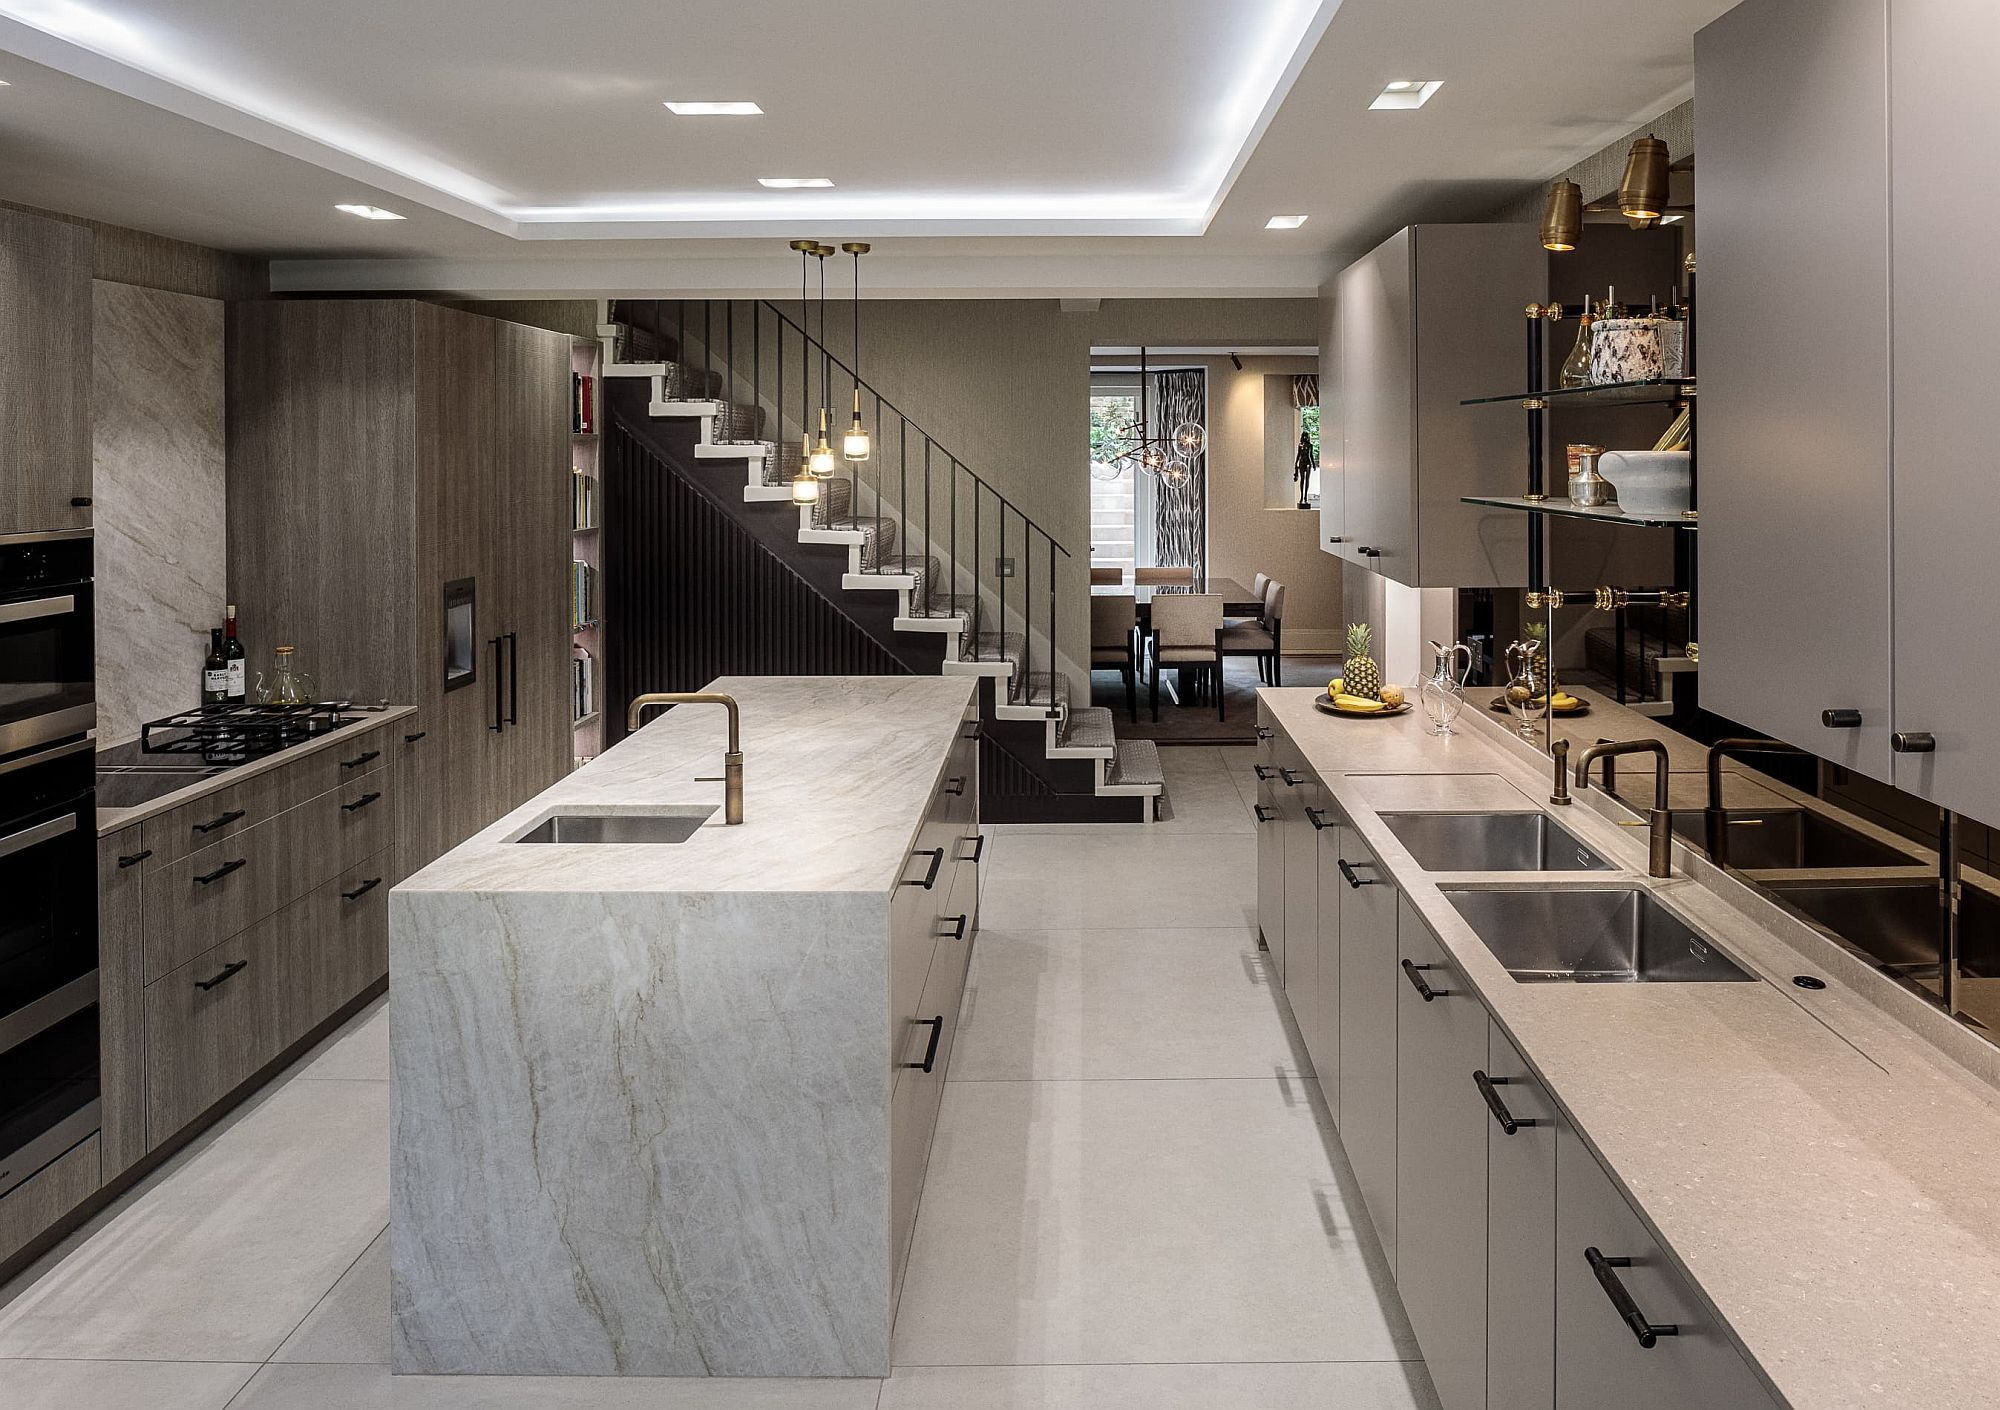 Lovely lighting foe the modern kitchen in white and gray